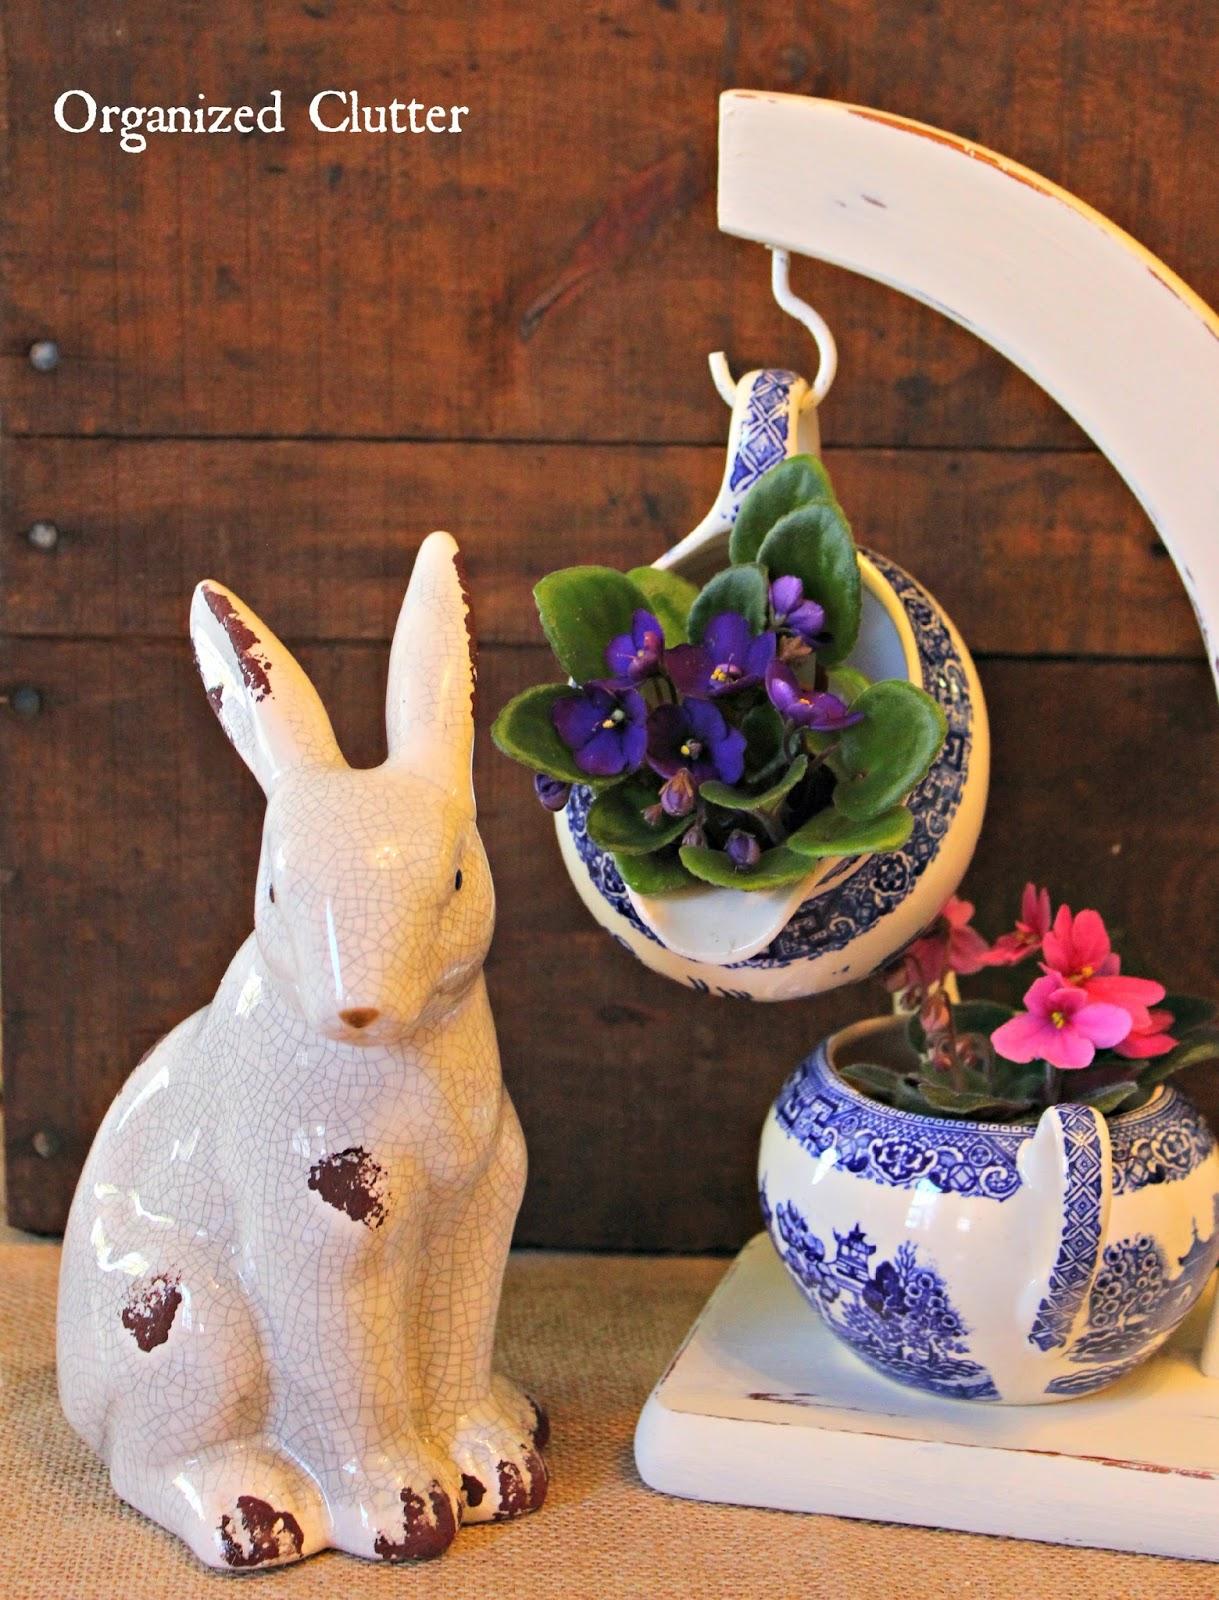 Spring Banana Stand & Creamer & Sugar Bowl Vignette